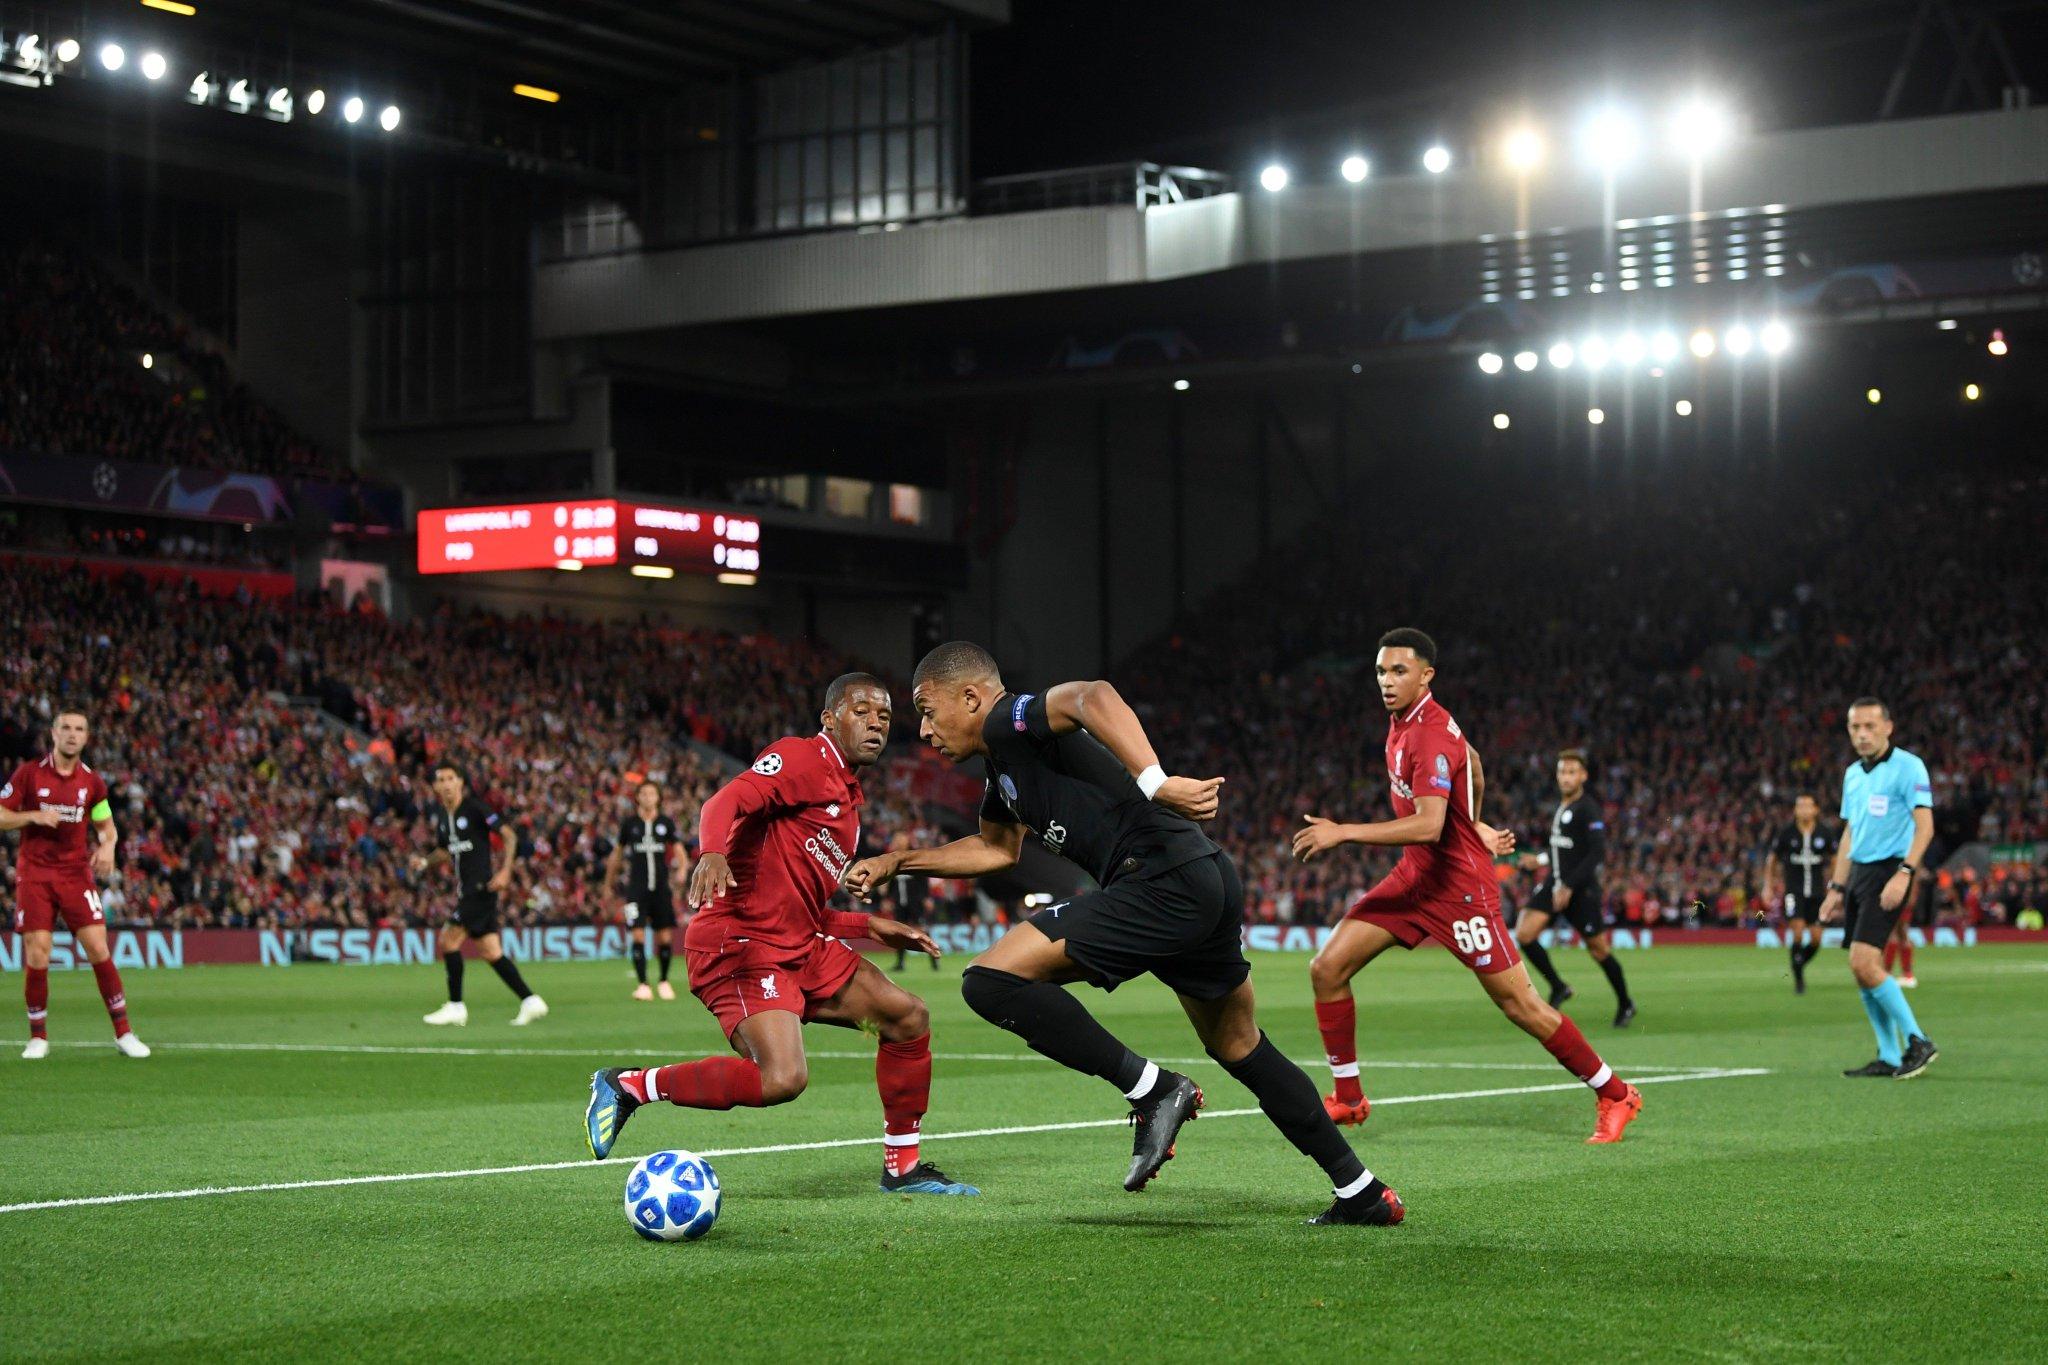 Liverpool 3-2 PSG Highlights